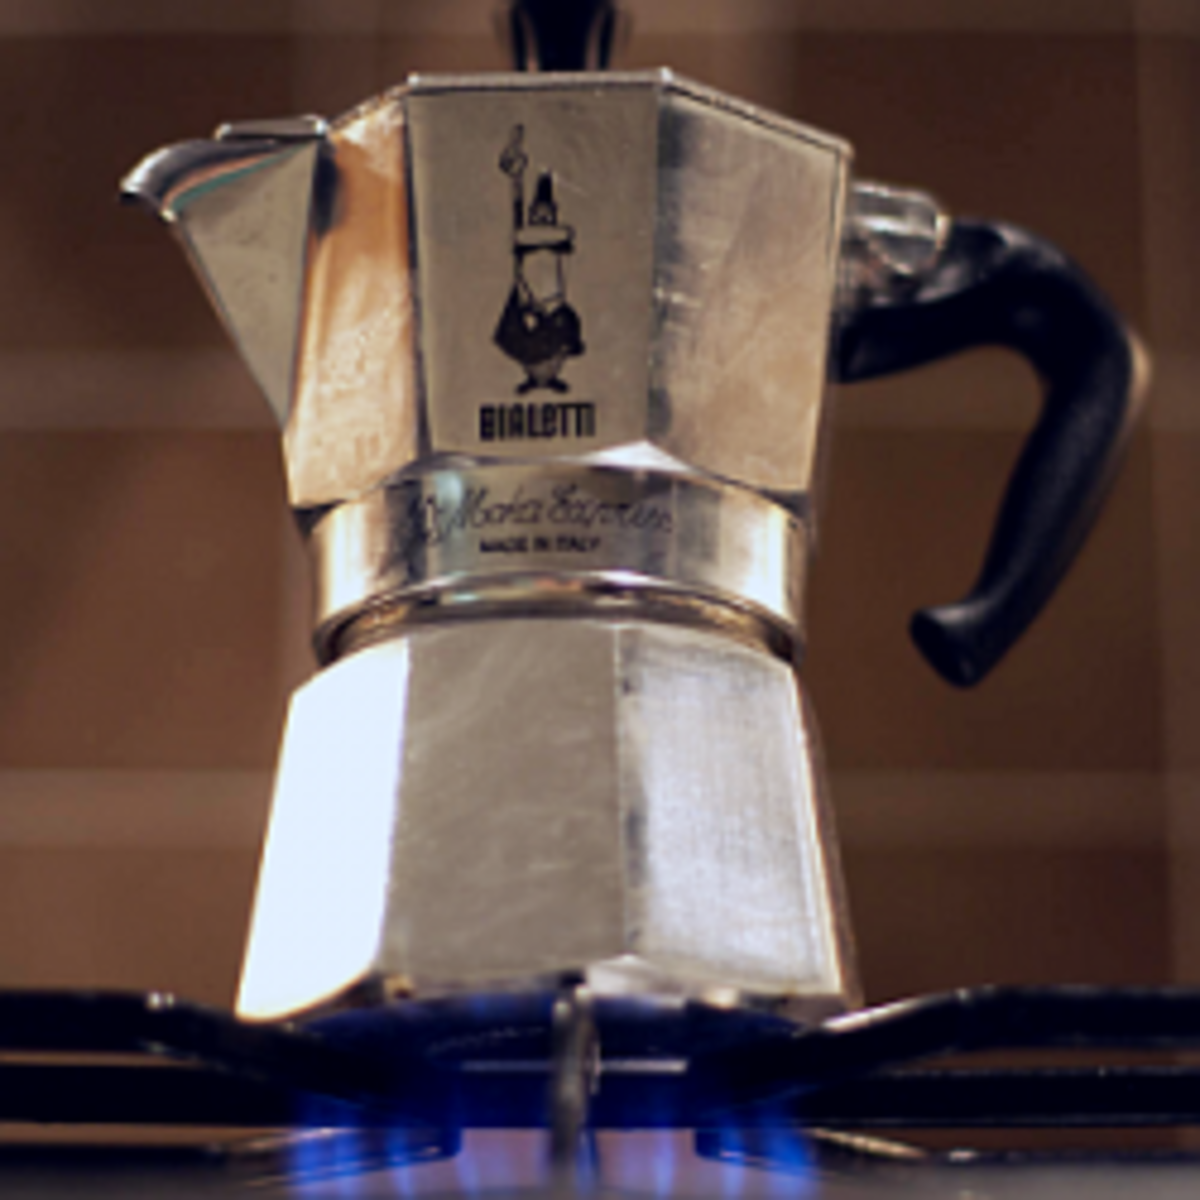 Moka Pot vs Aeropress vs French Press - Espresso Alternative Brews